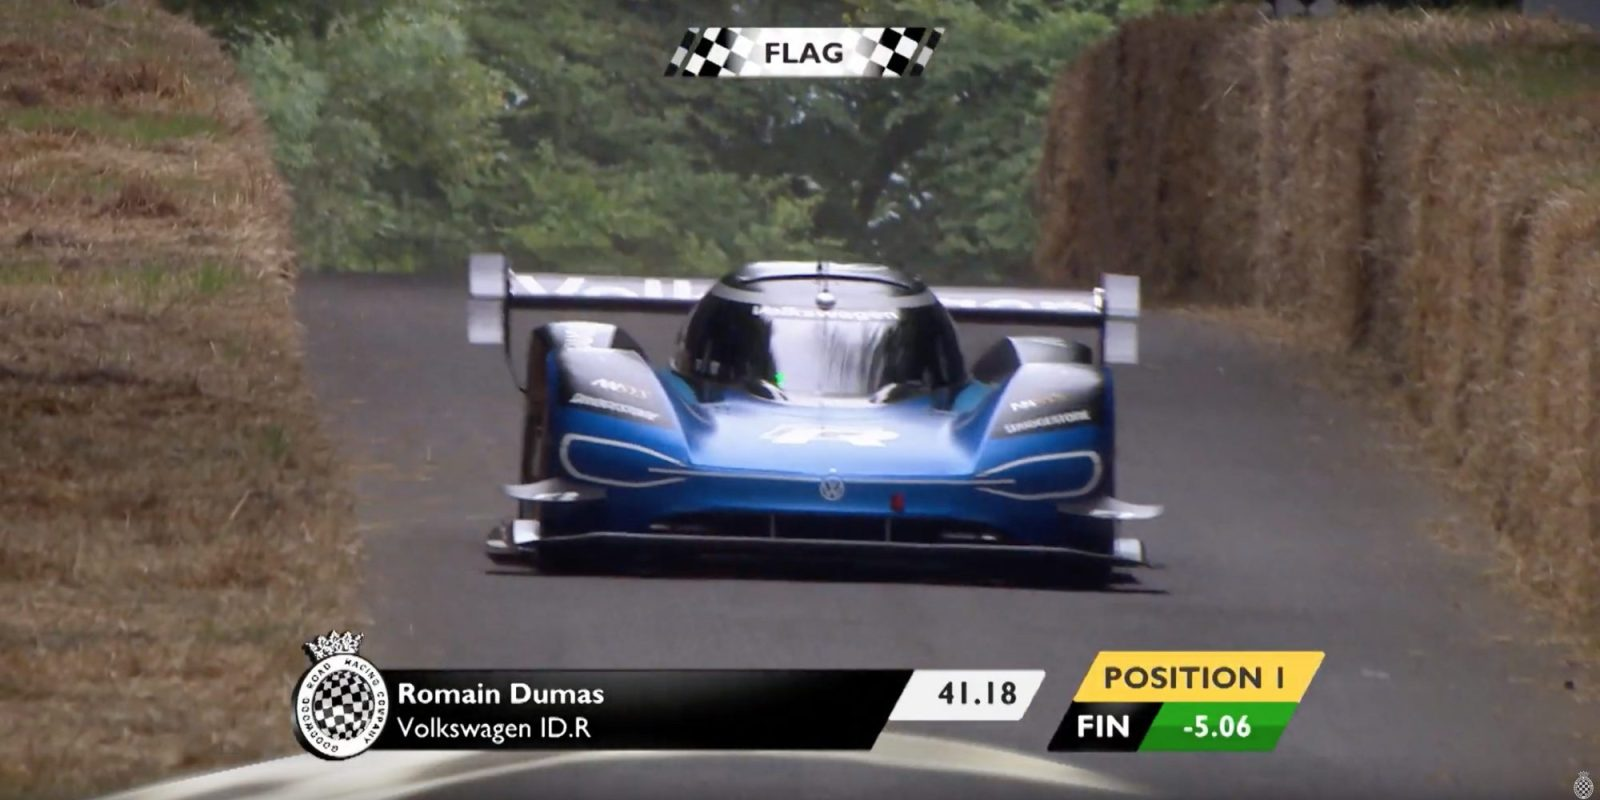 Volkswagen ID.R breaks 20-year-old Goodwood hillclimb record set by V10 F1 car